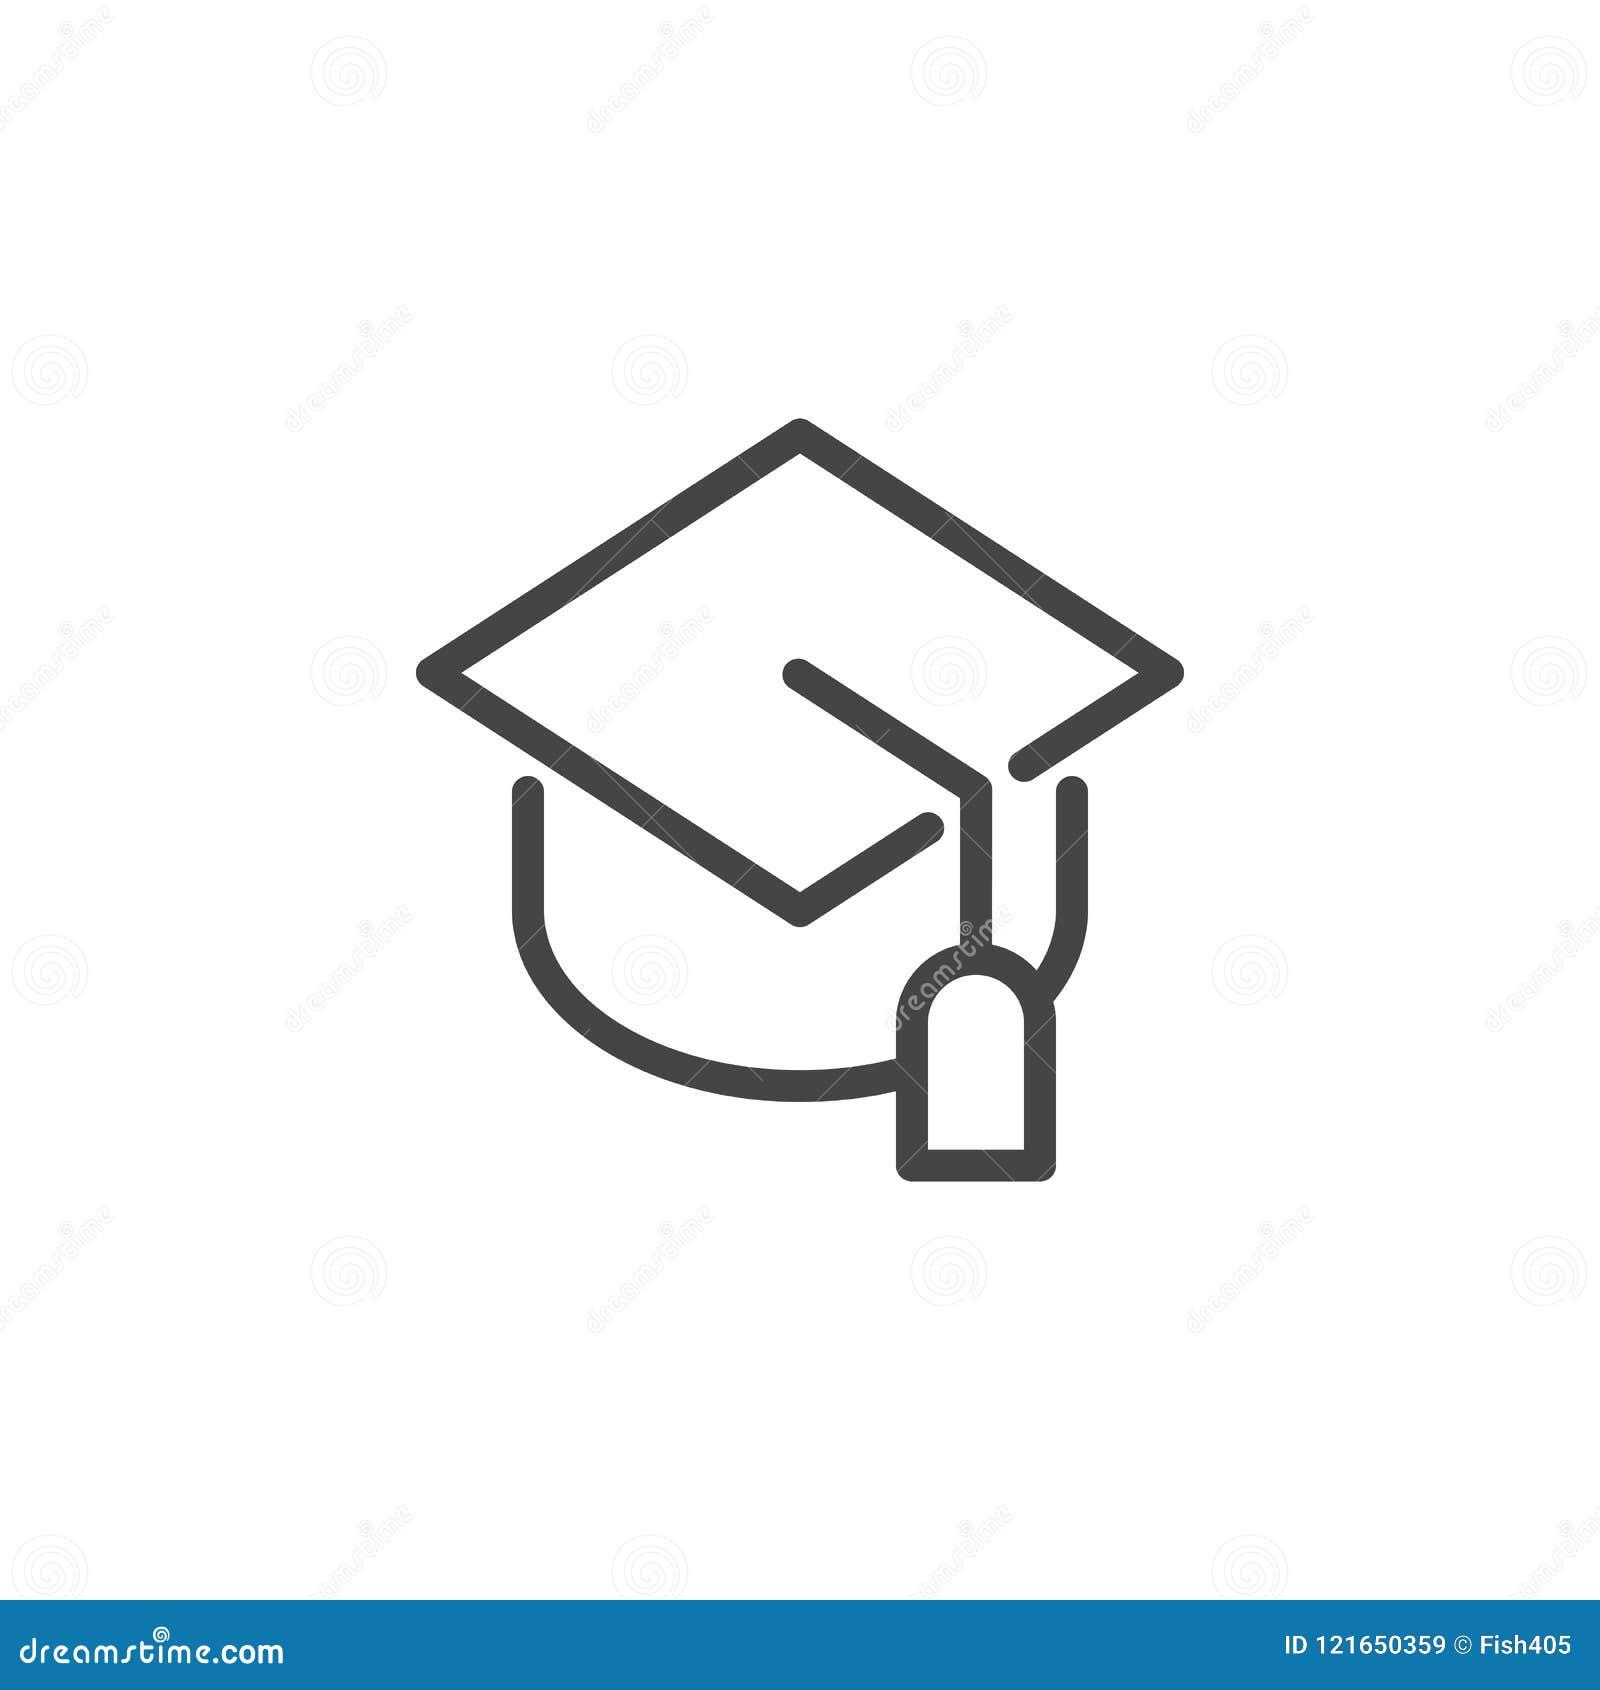 Graduation Cap Line Icon Students Hat Pictograph Symbol Of